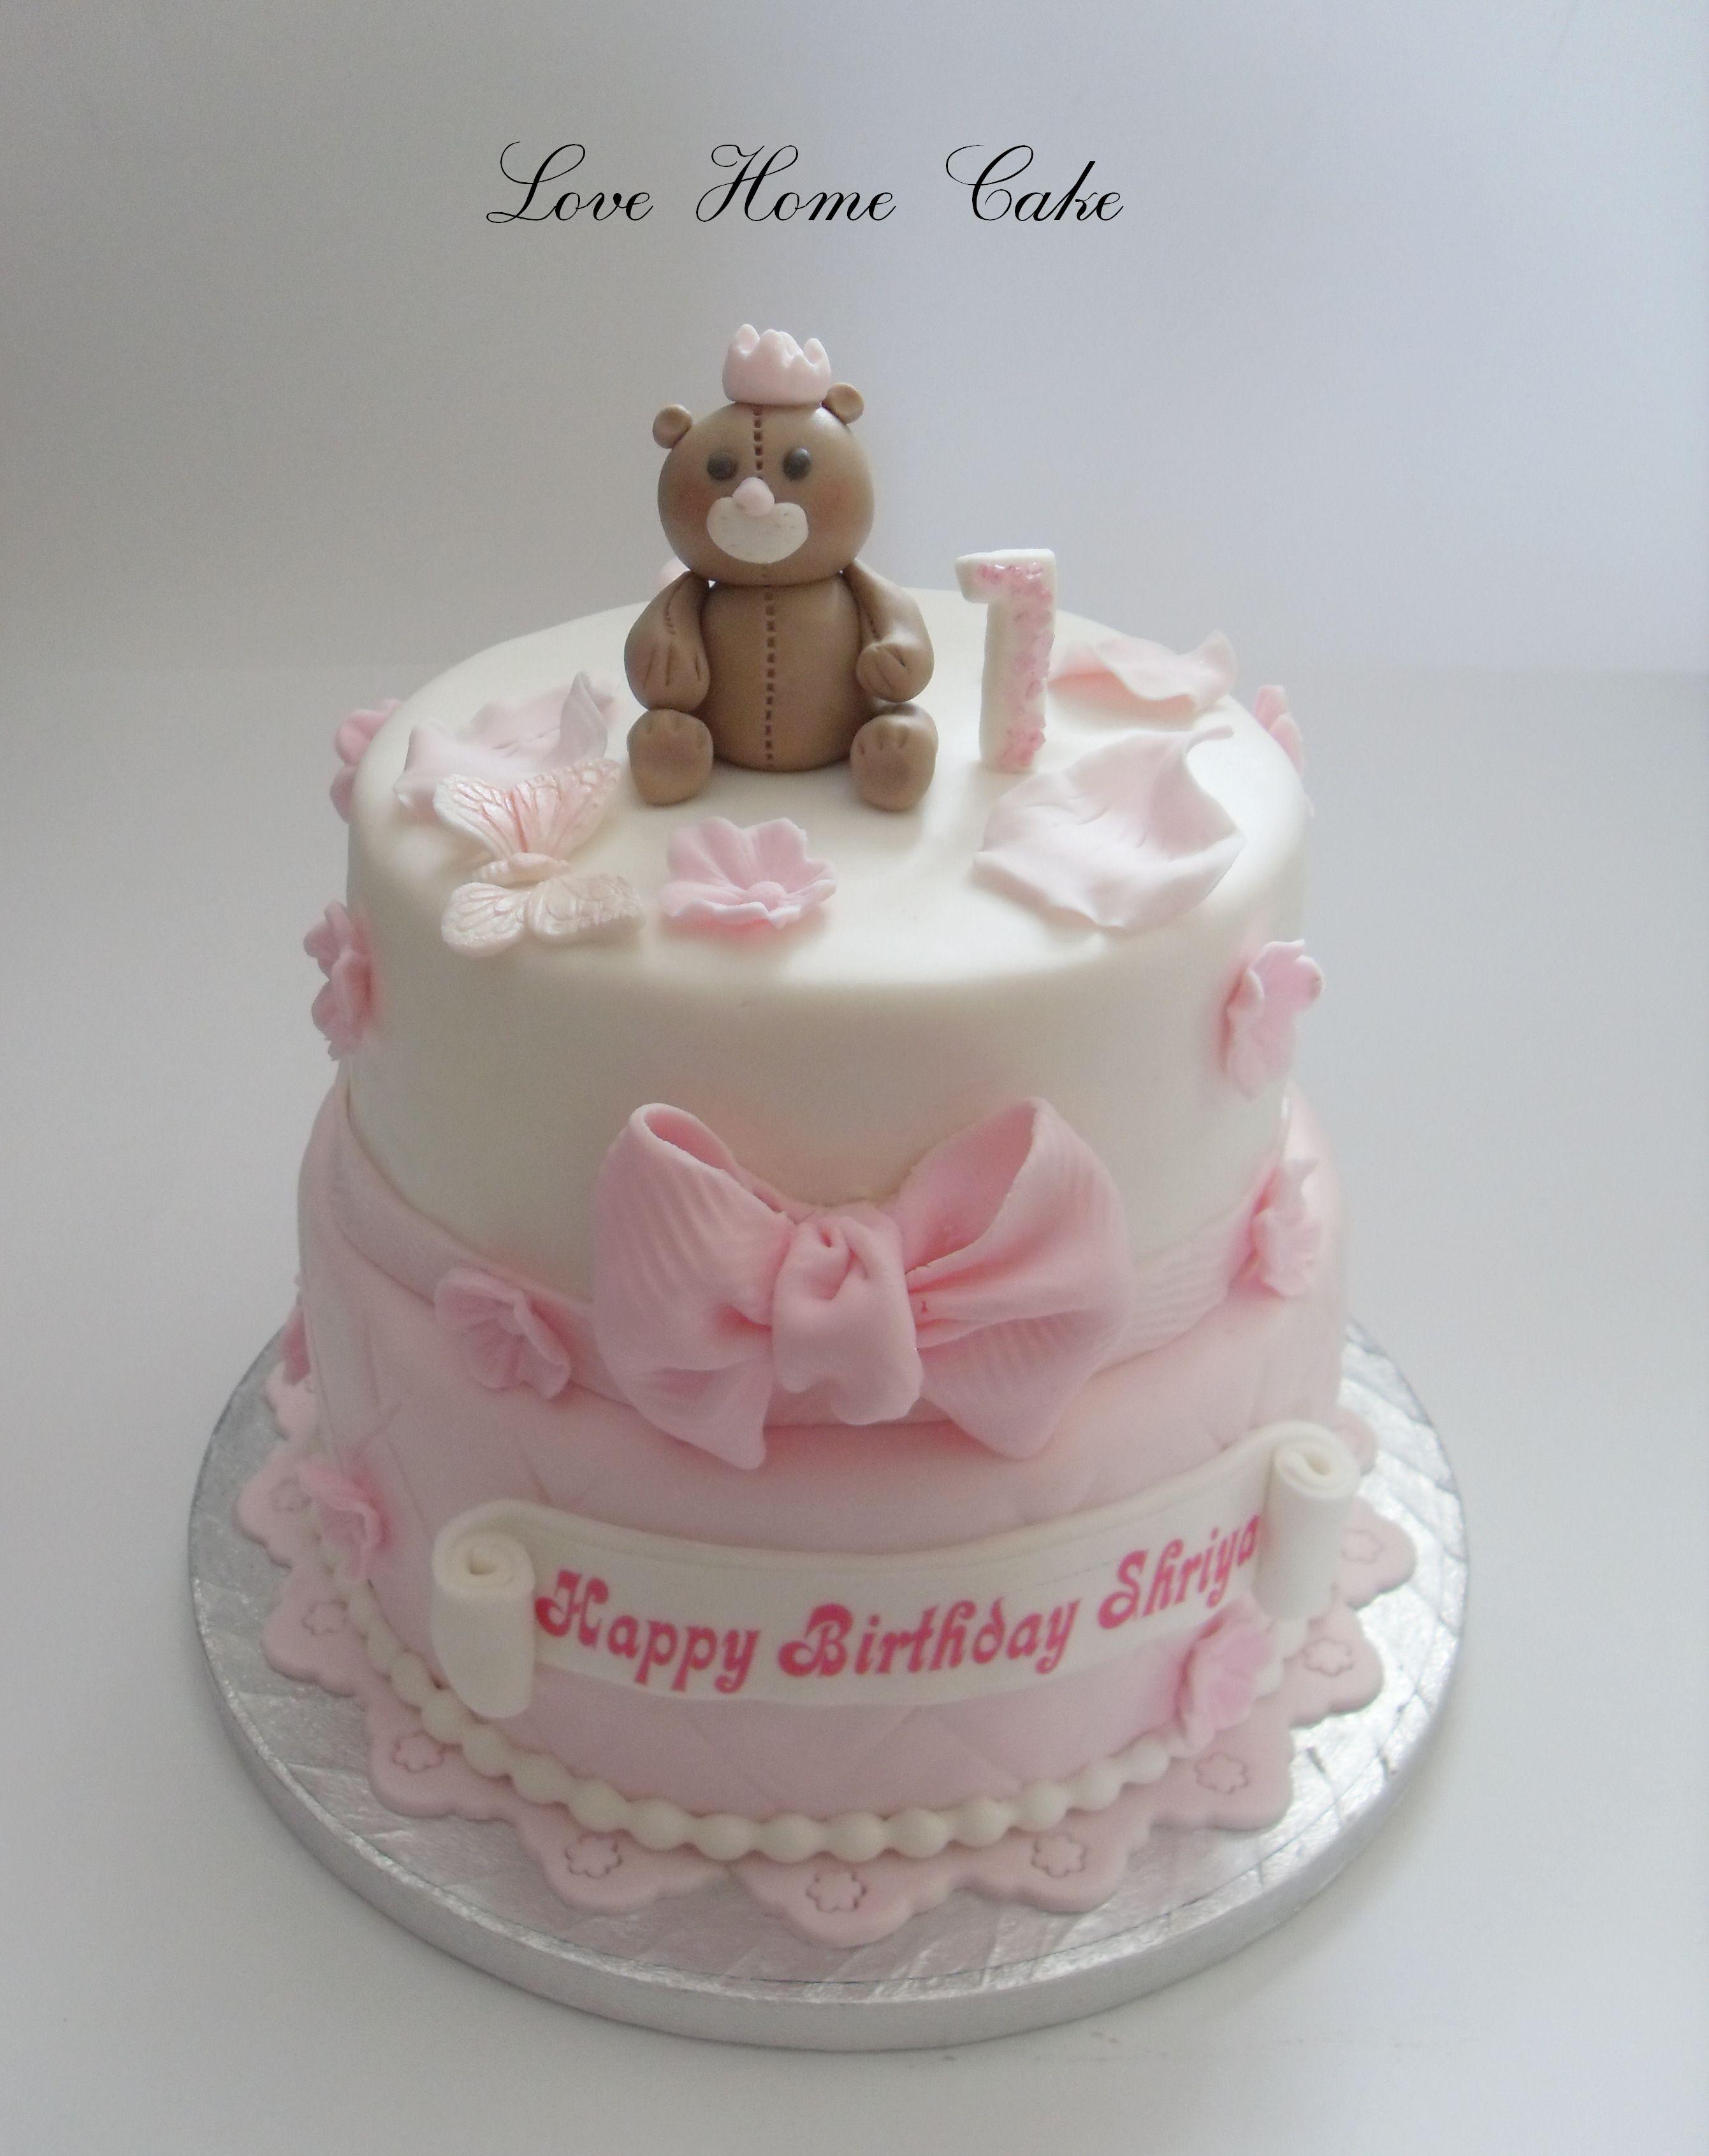 2 Tier 1st Birthday Cake For A Girl Cake Minnie Mouse Birthday Cakes First Birthday Cakes